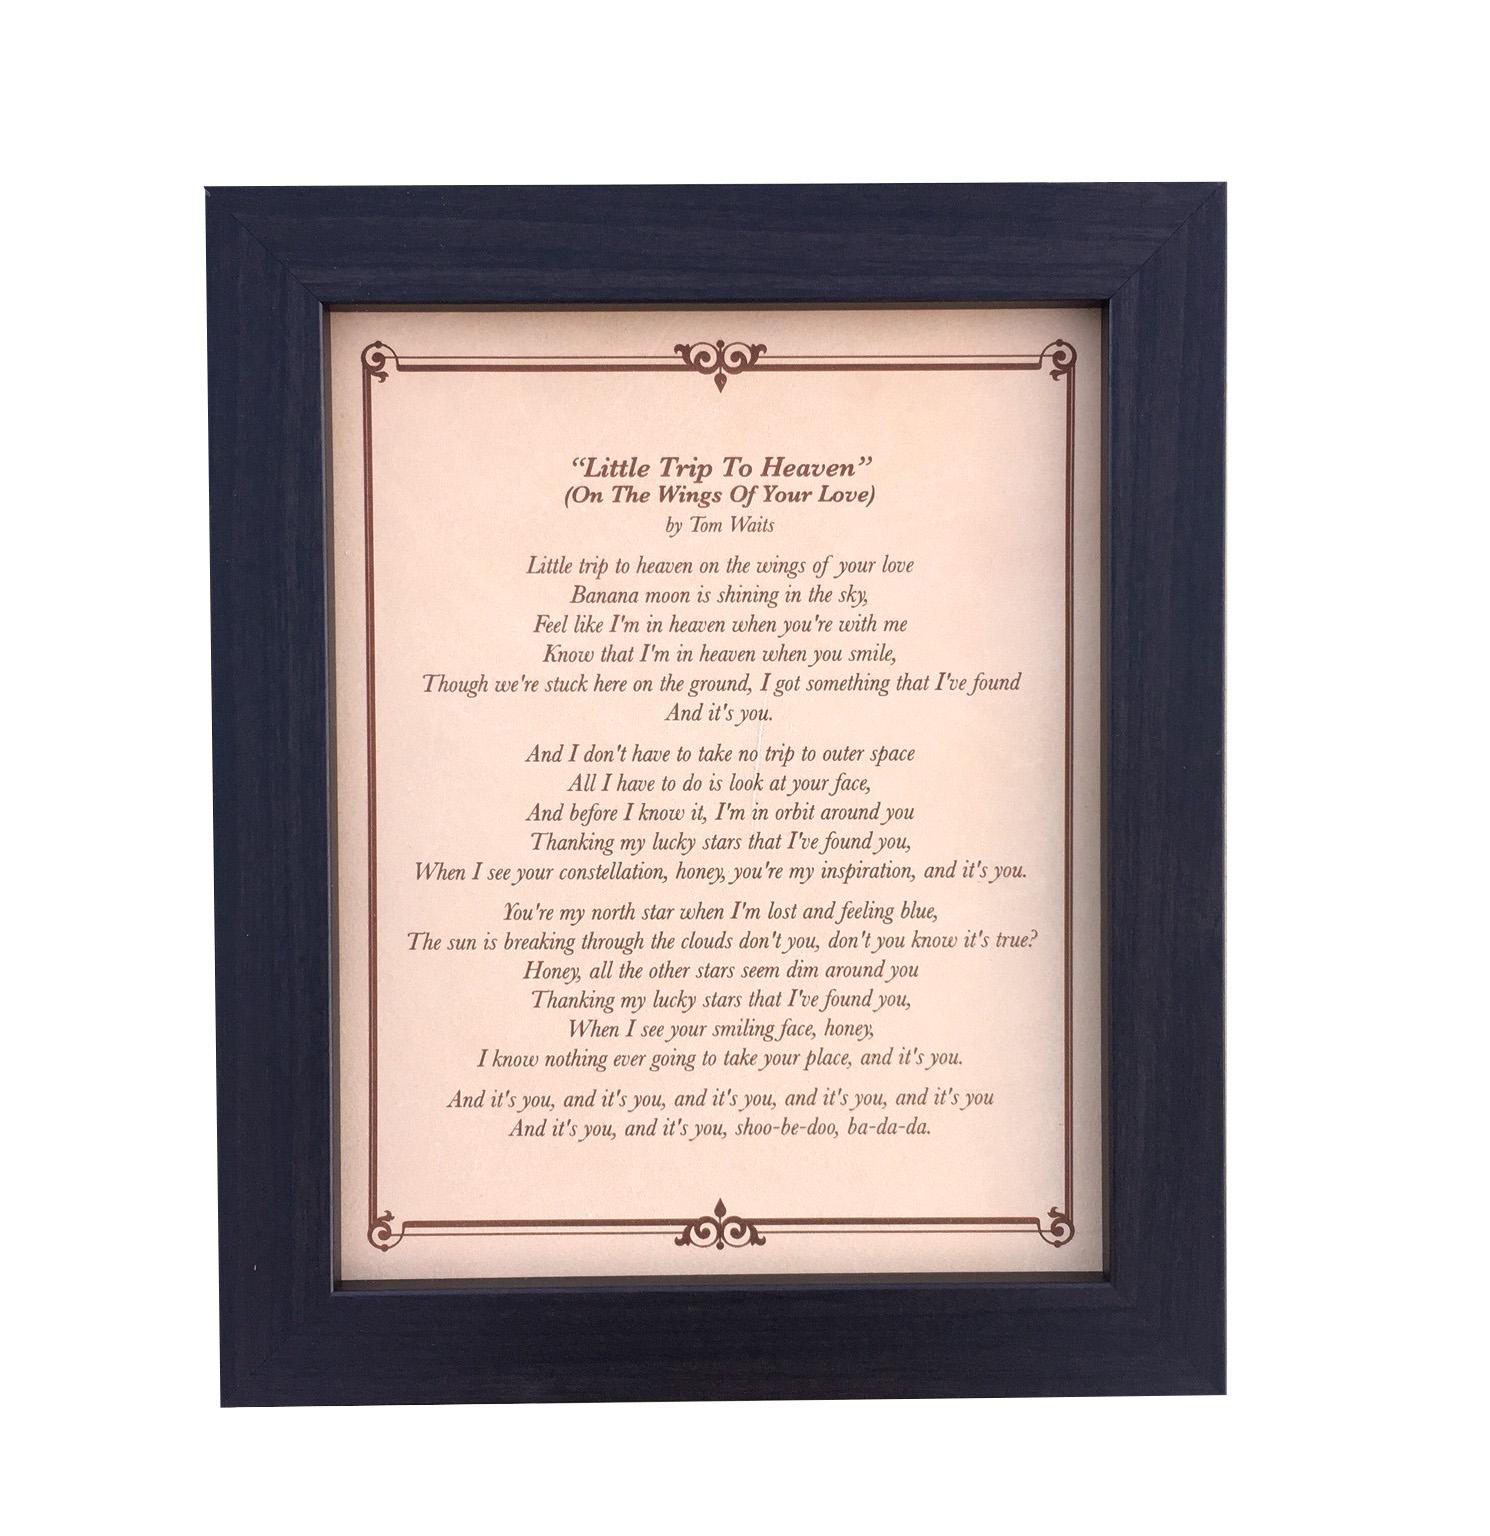 Song lyrics engraved on leather